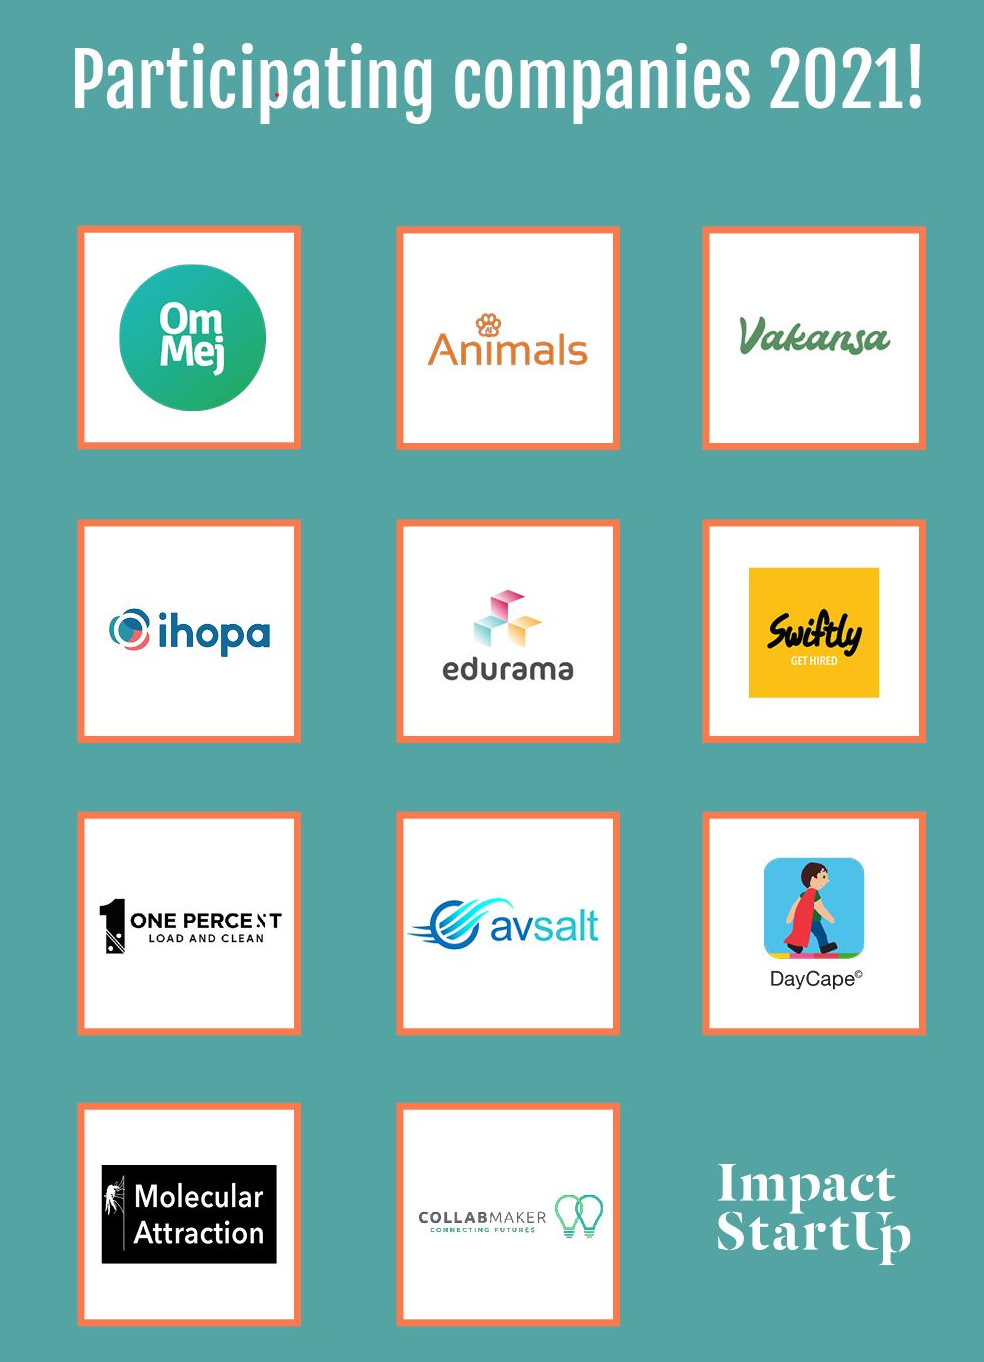 Avsalt an Impact Startup company